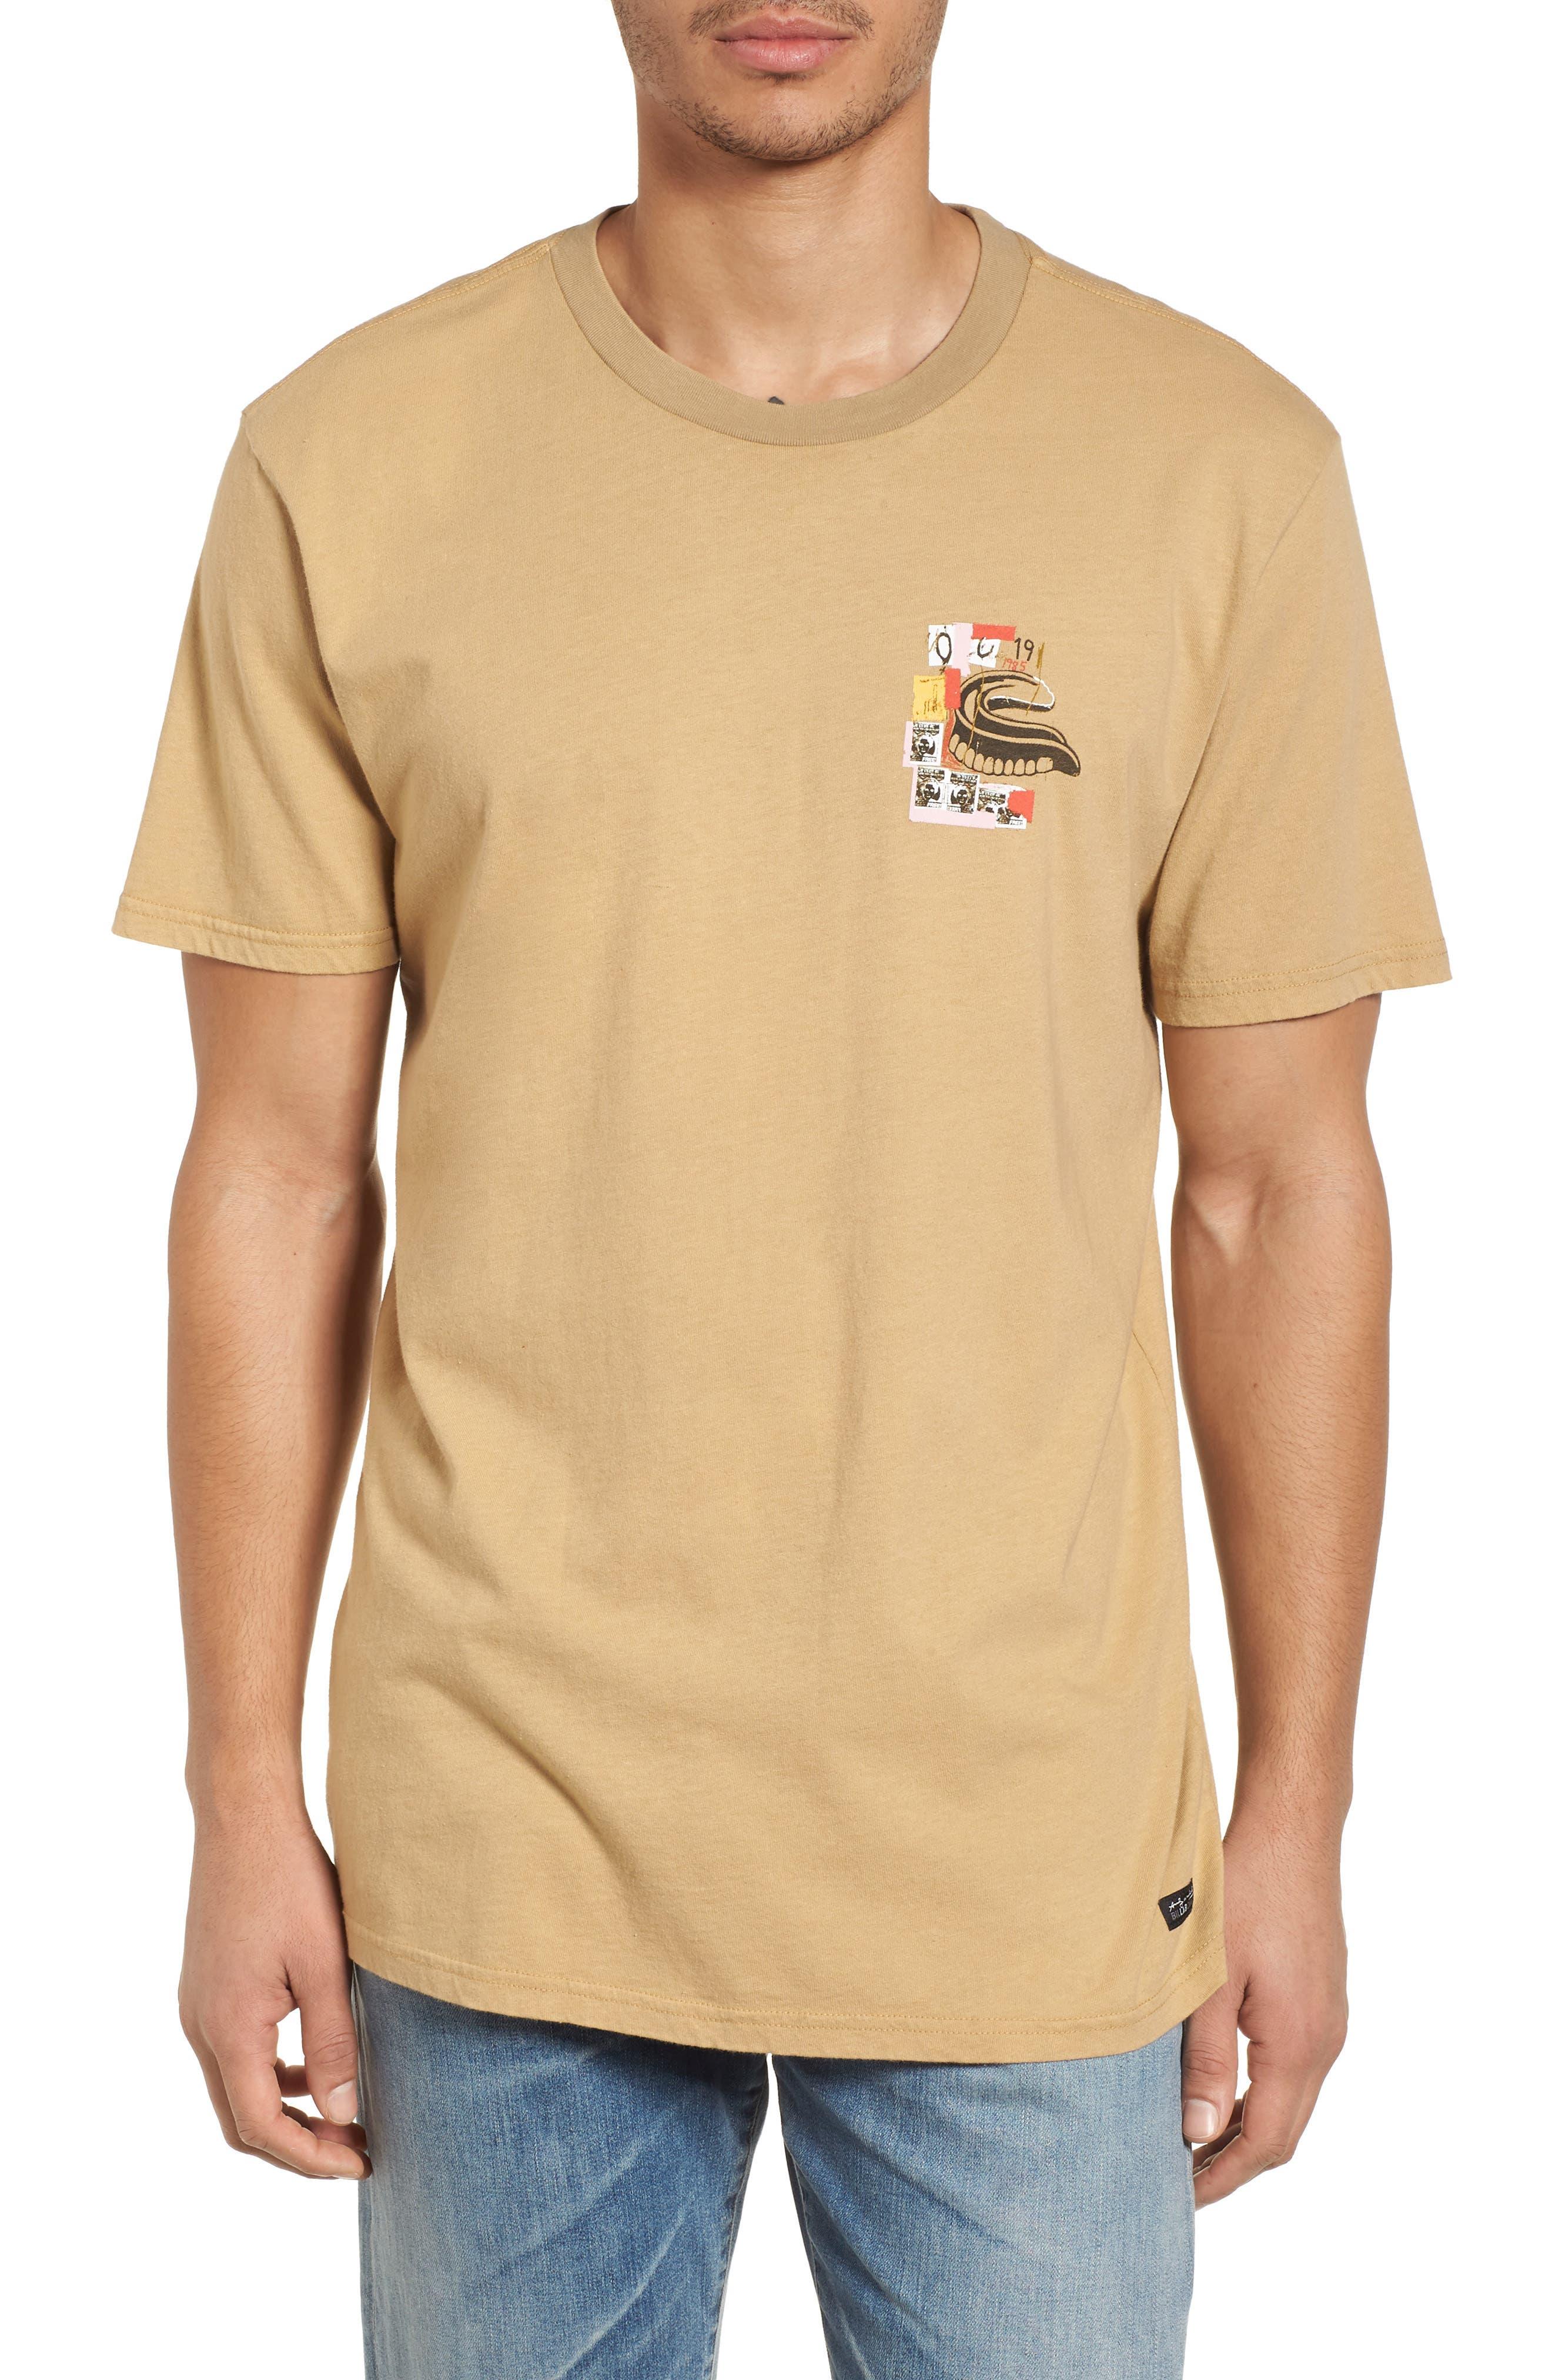 x Warhol Eighty Graphic T-Shirt,                             Main thumbnail 1, color,                             Straw